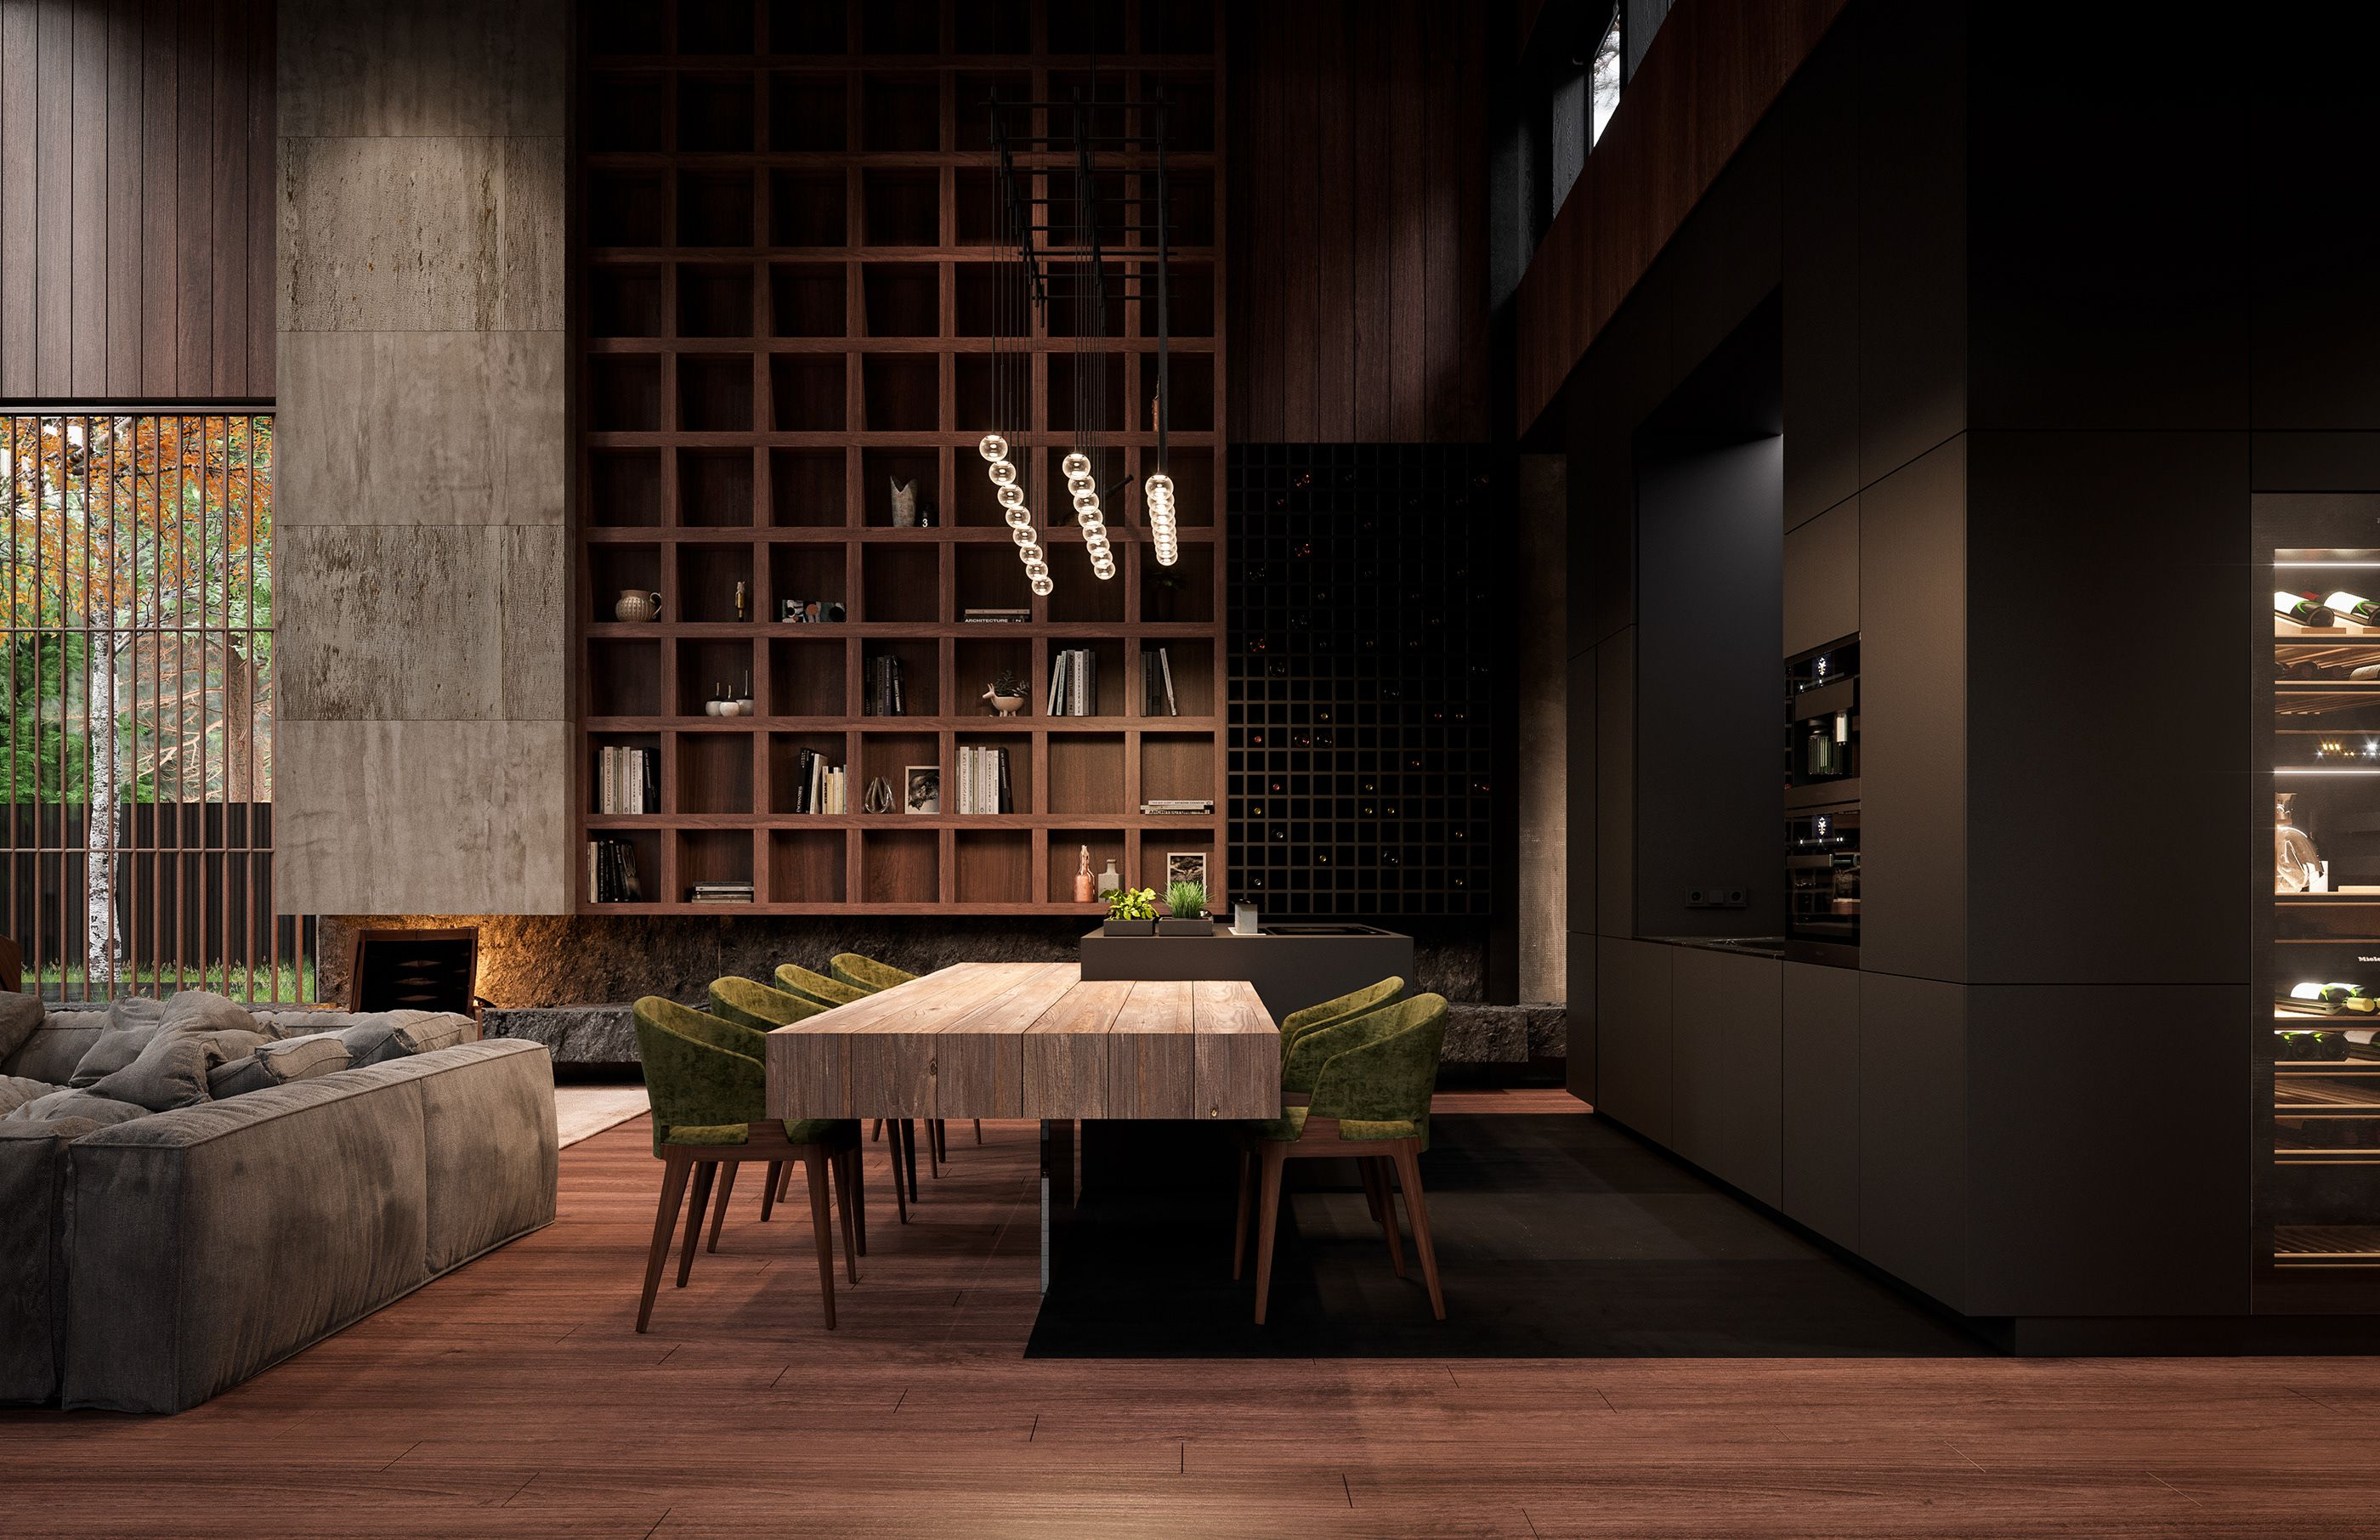 Arredamento Casa Roma roma house interior | buro511 on behance (with images